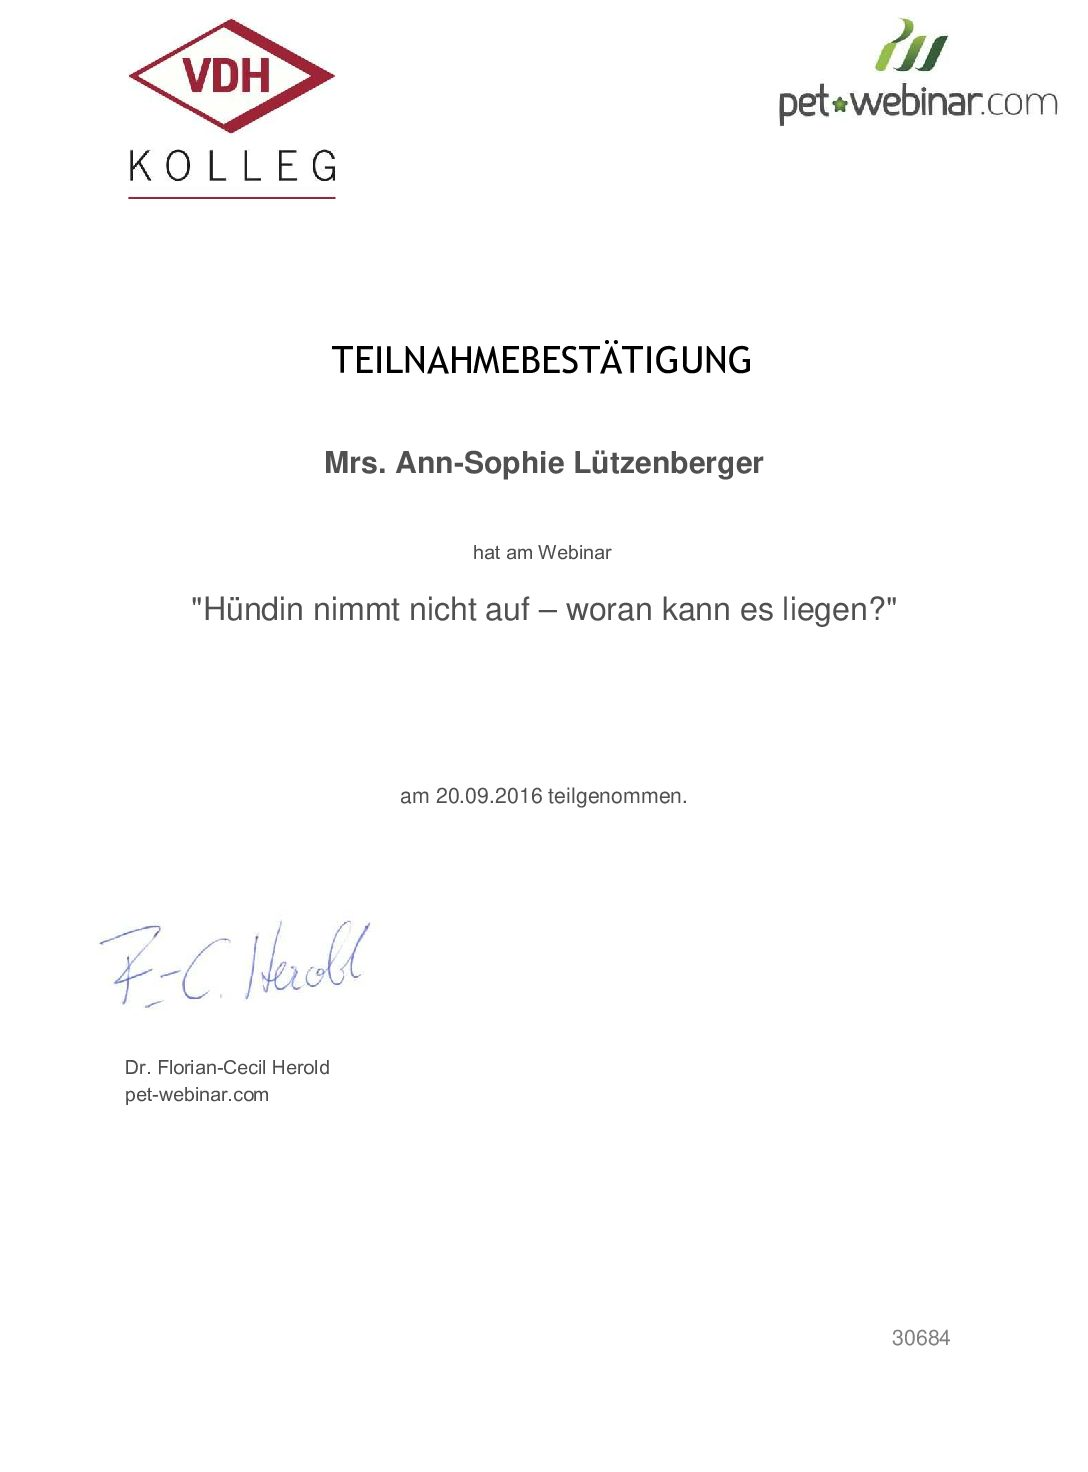 VDH Kolleg